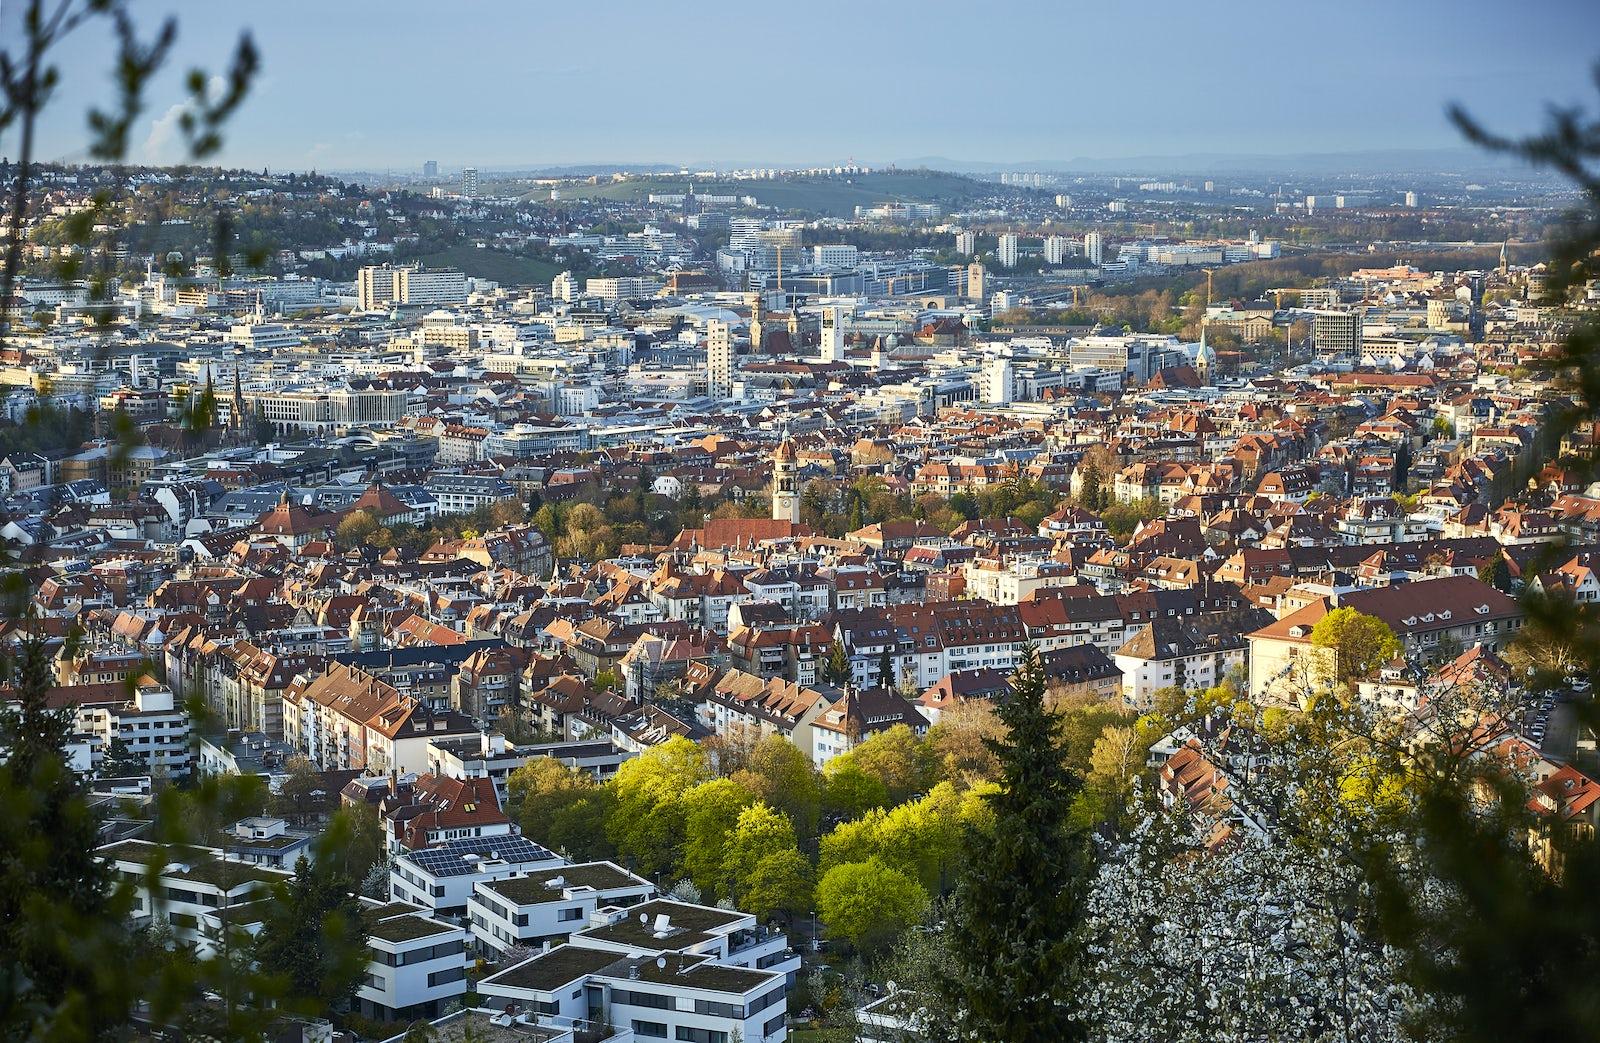 !i18n:pt:data.cities:stuttgart.picture.caption